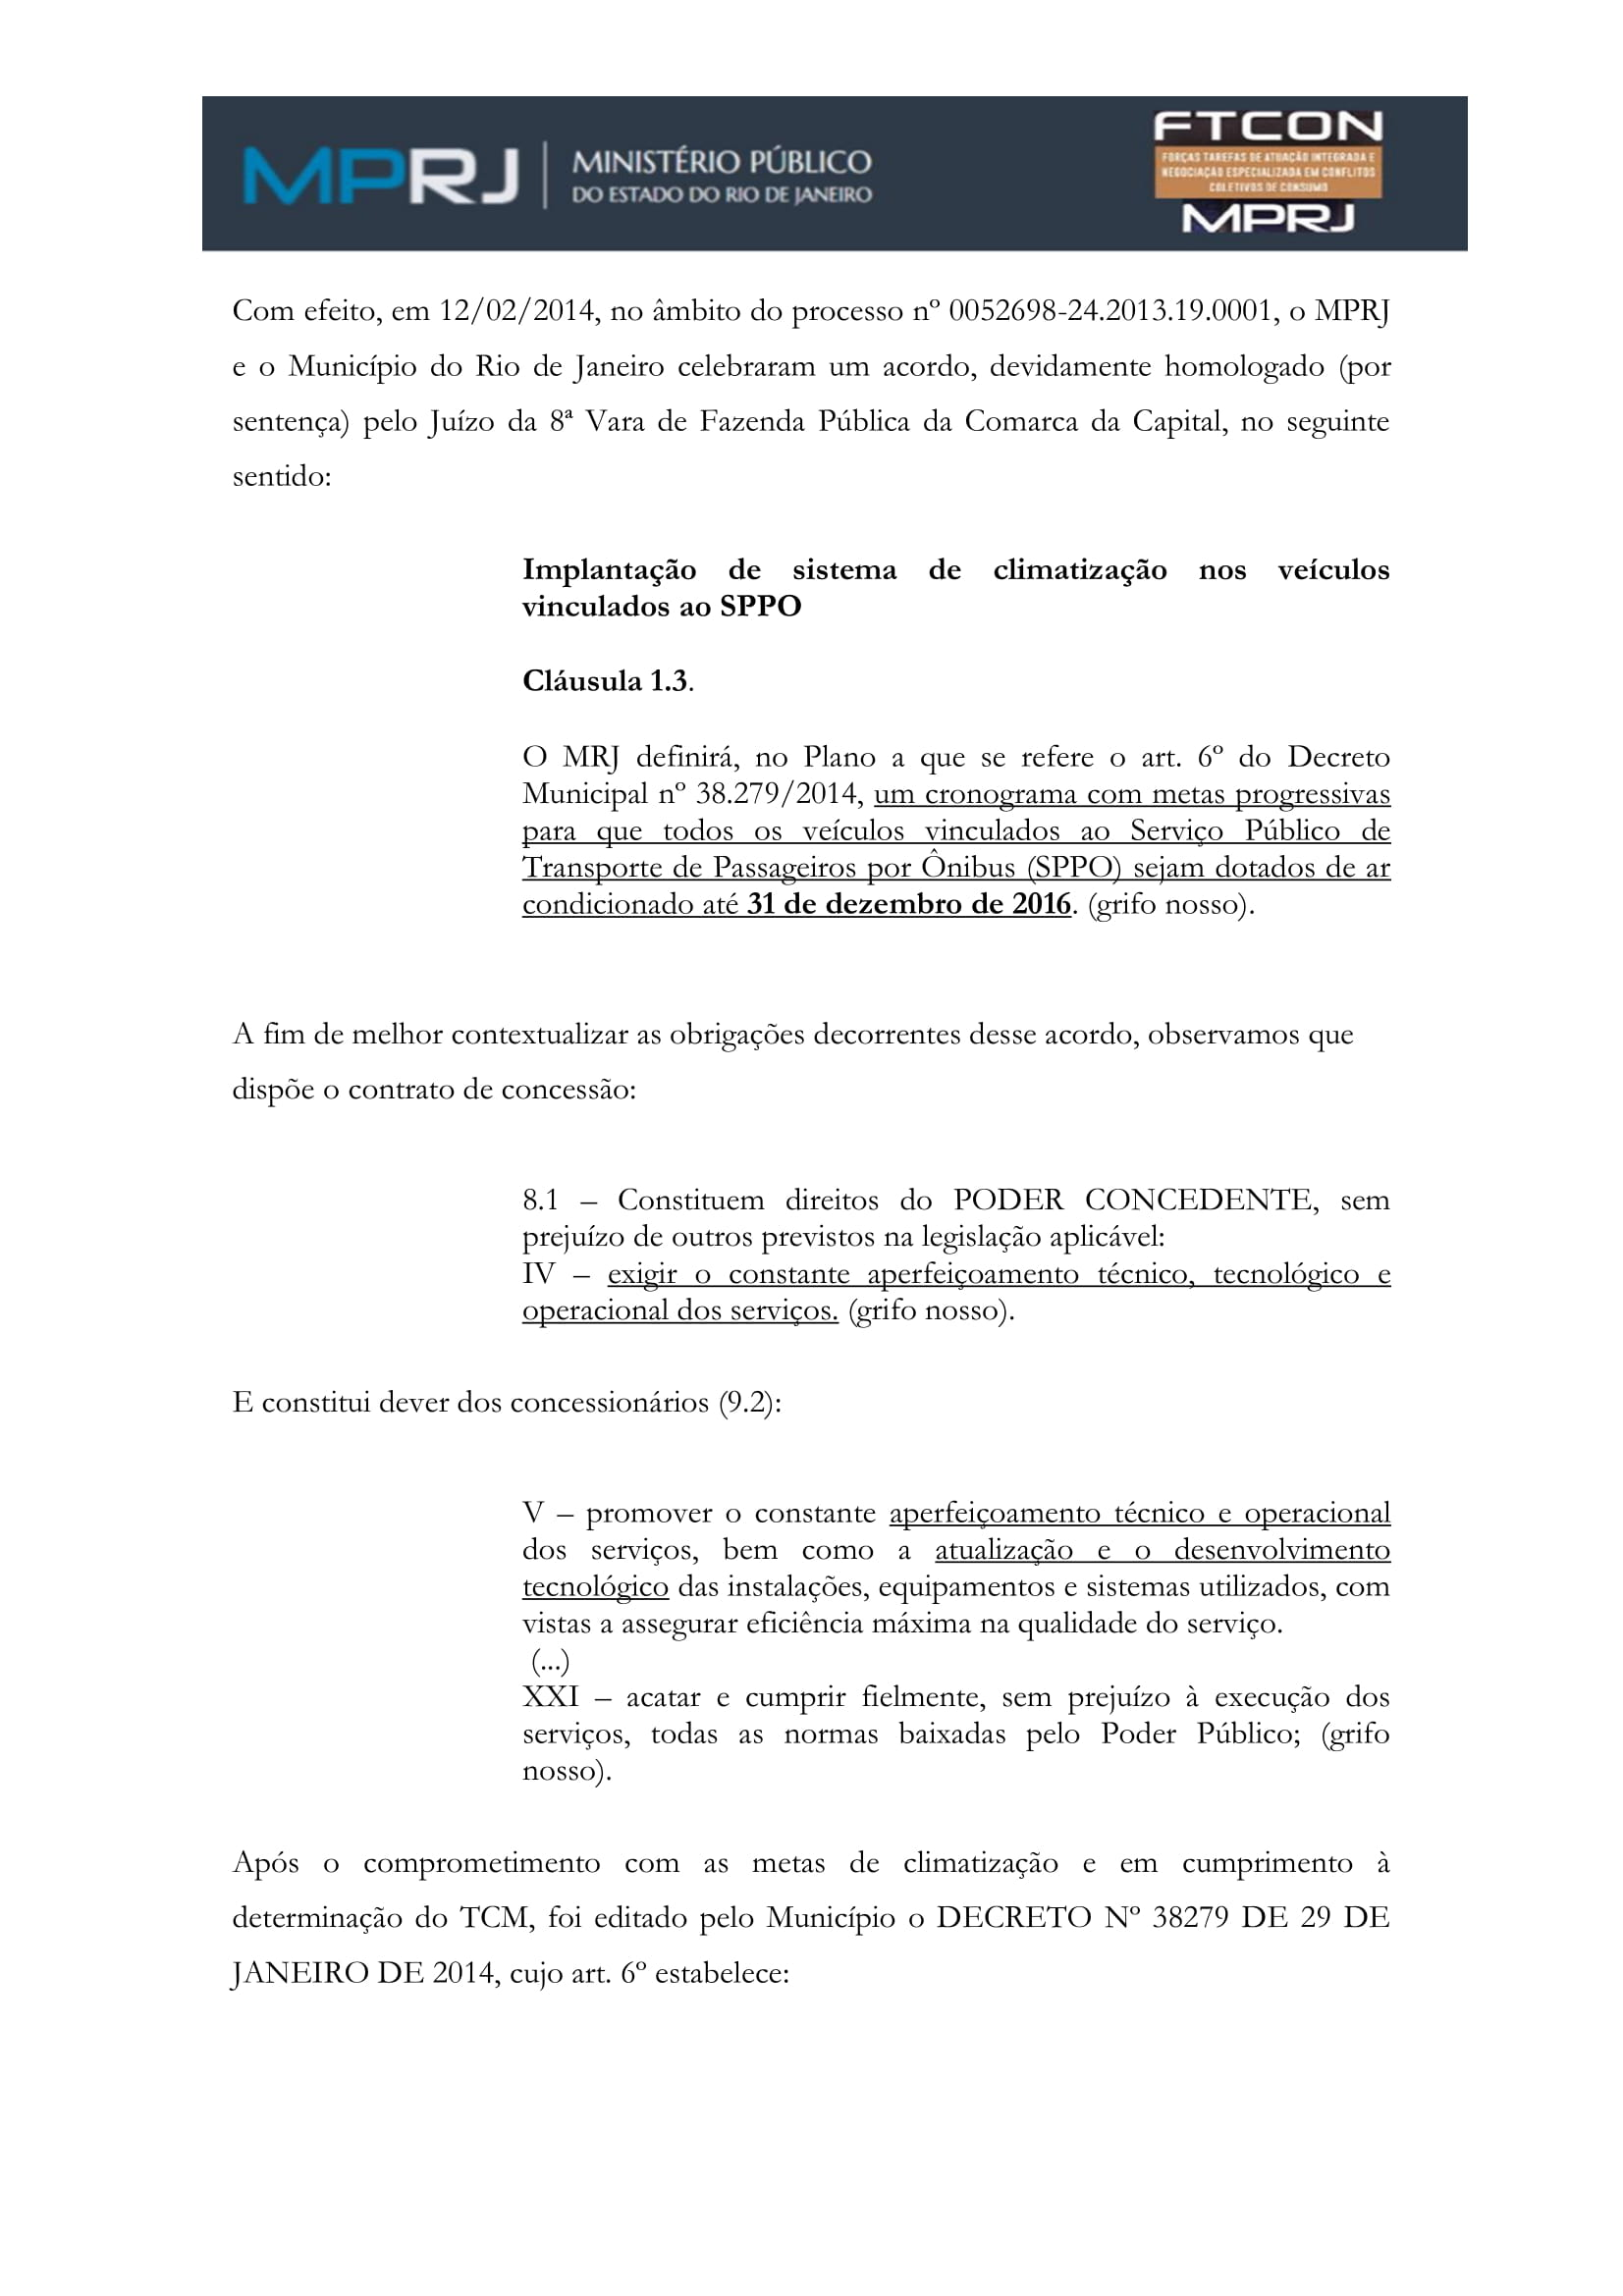 acp_caducidade_onibus_dr_rt-038